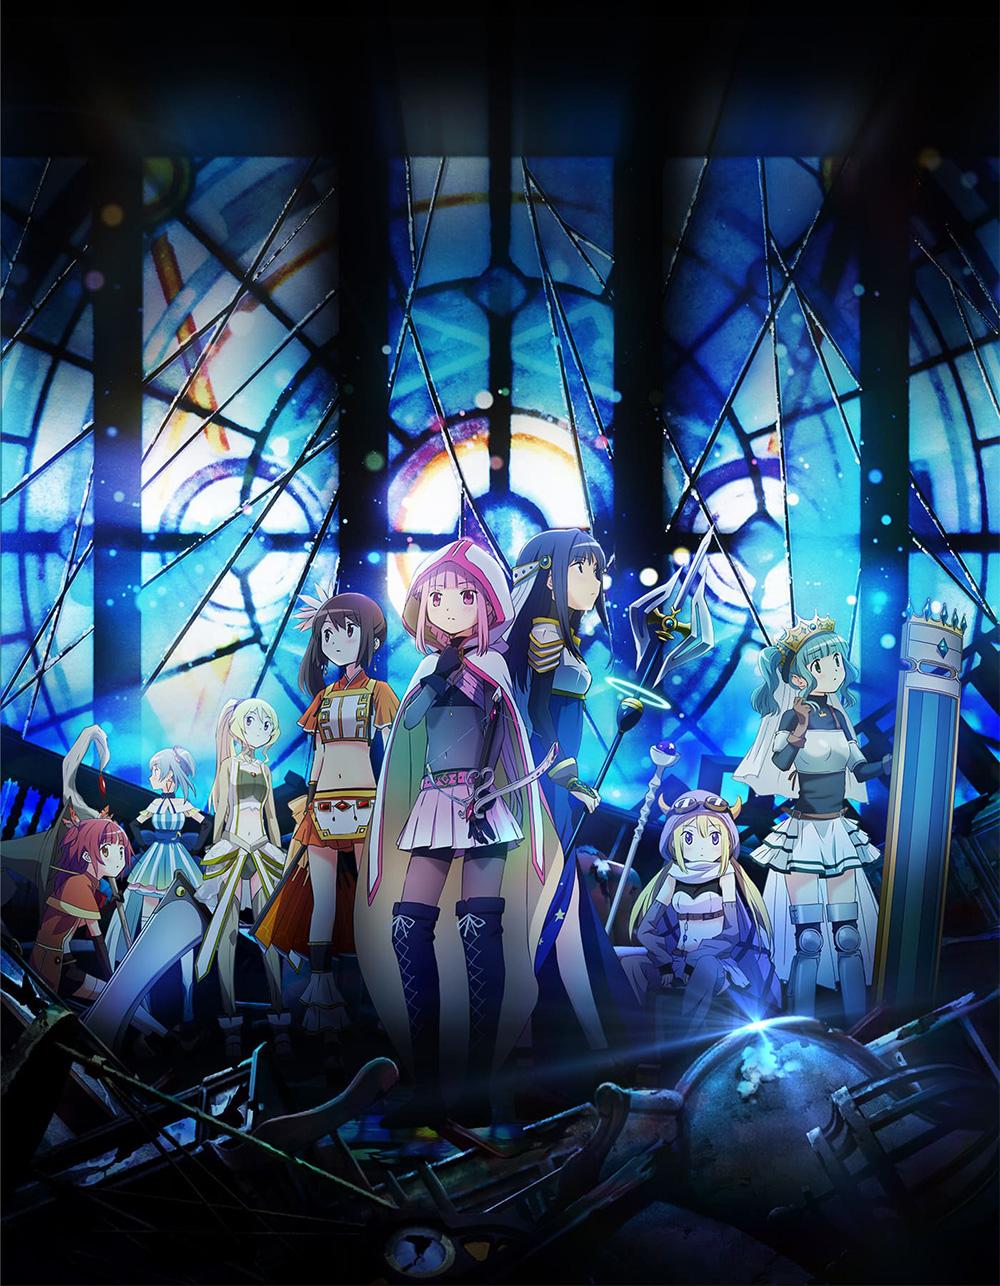 Magia-Record-Mahou-Shoujo-Madoka-Magica-Gaiden-Anime-Visual